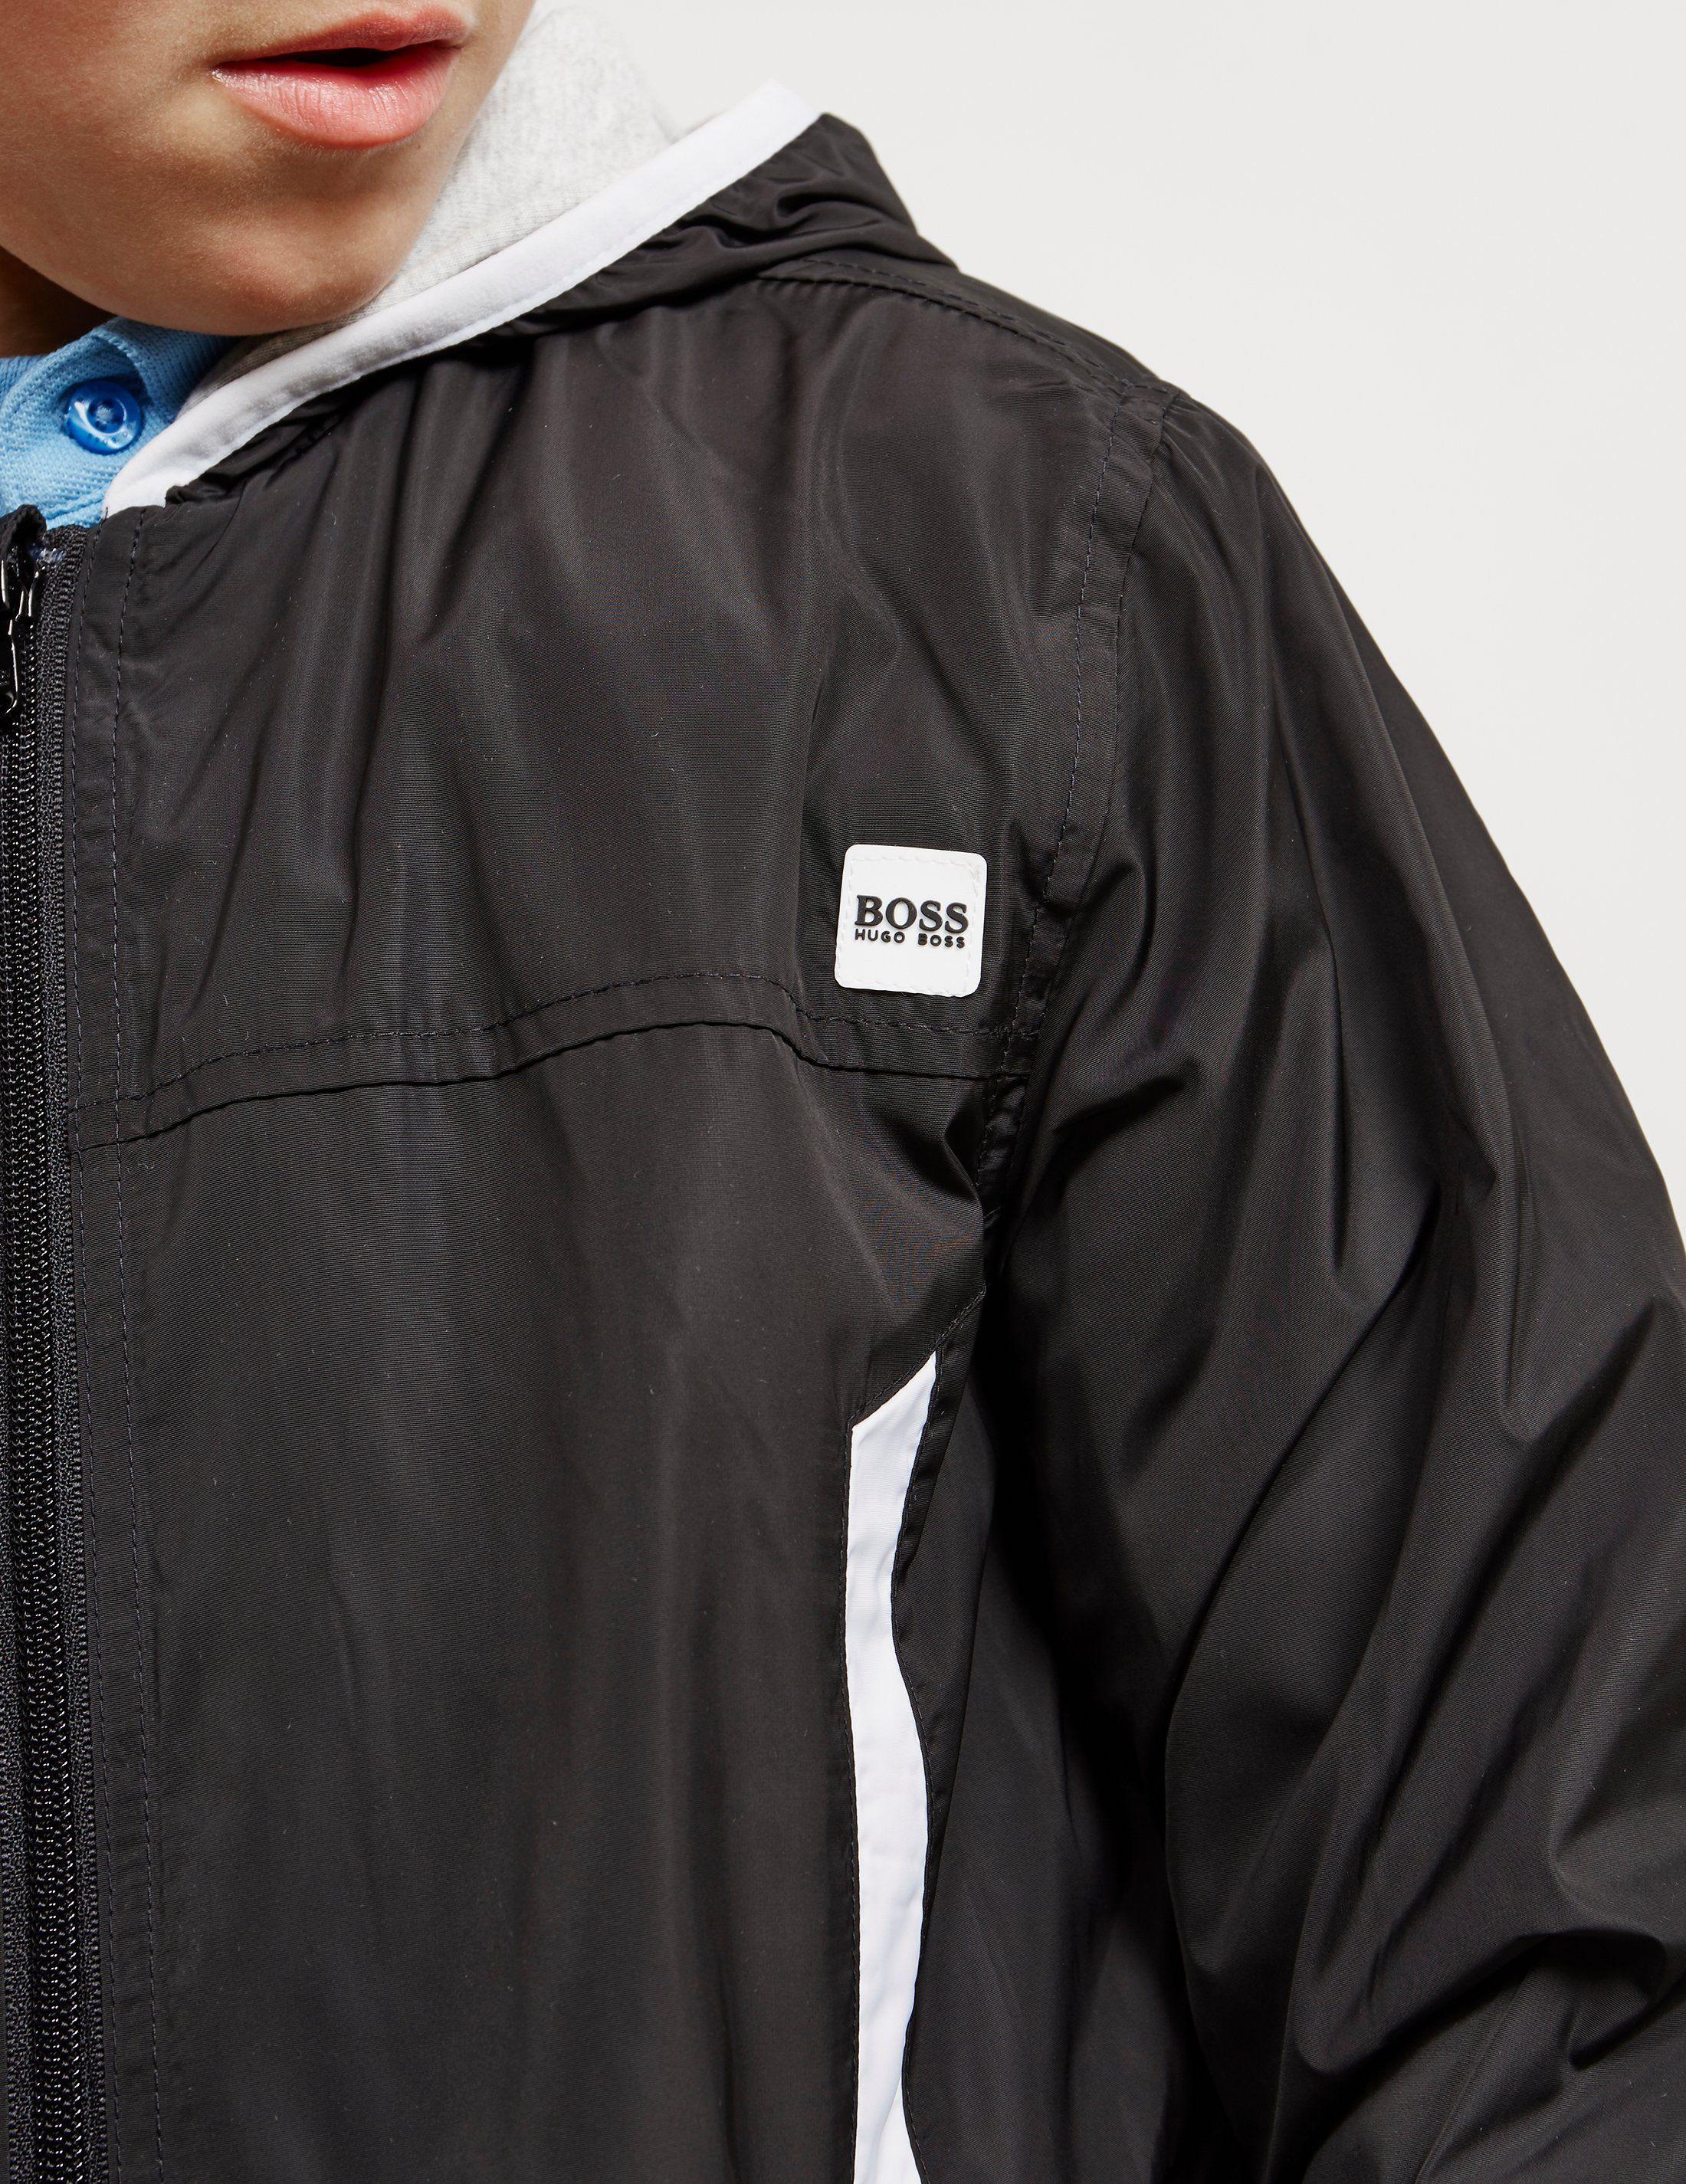 BOSS Hooded Jacket